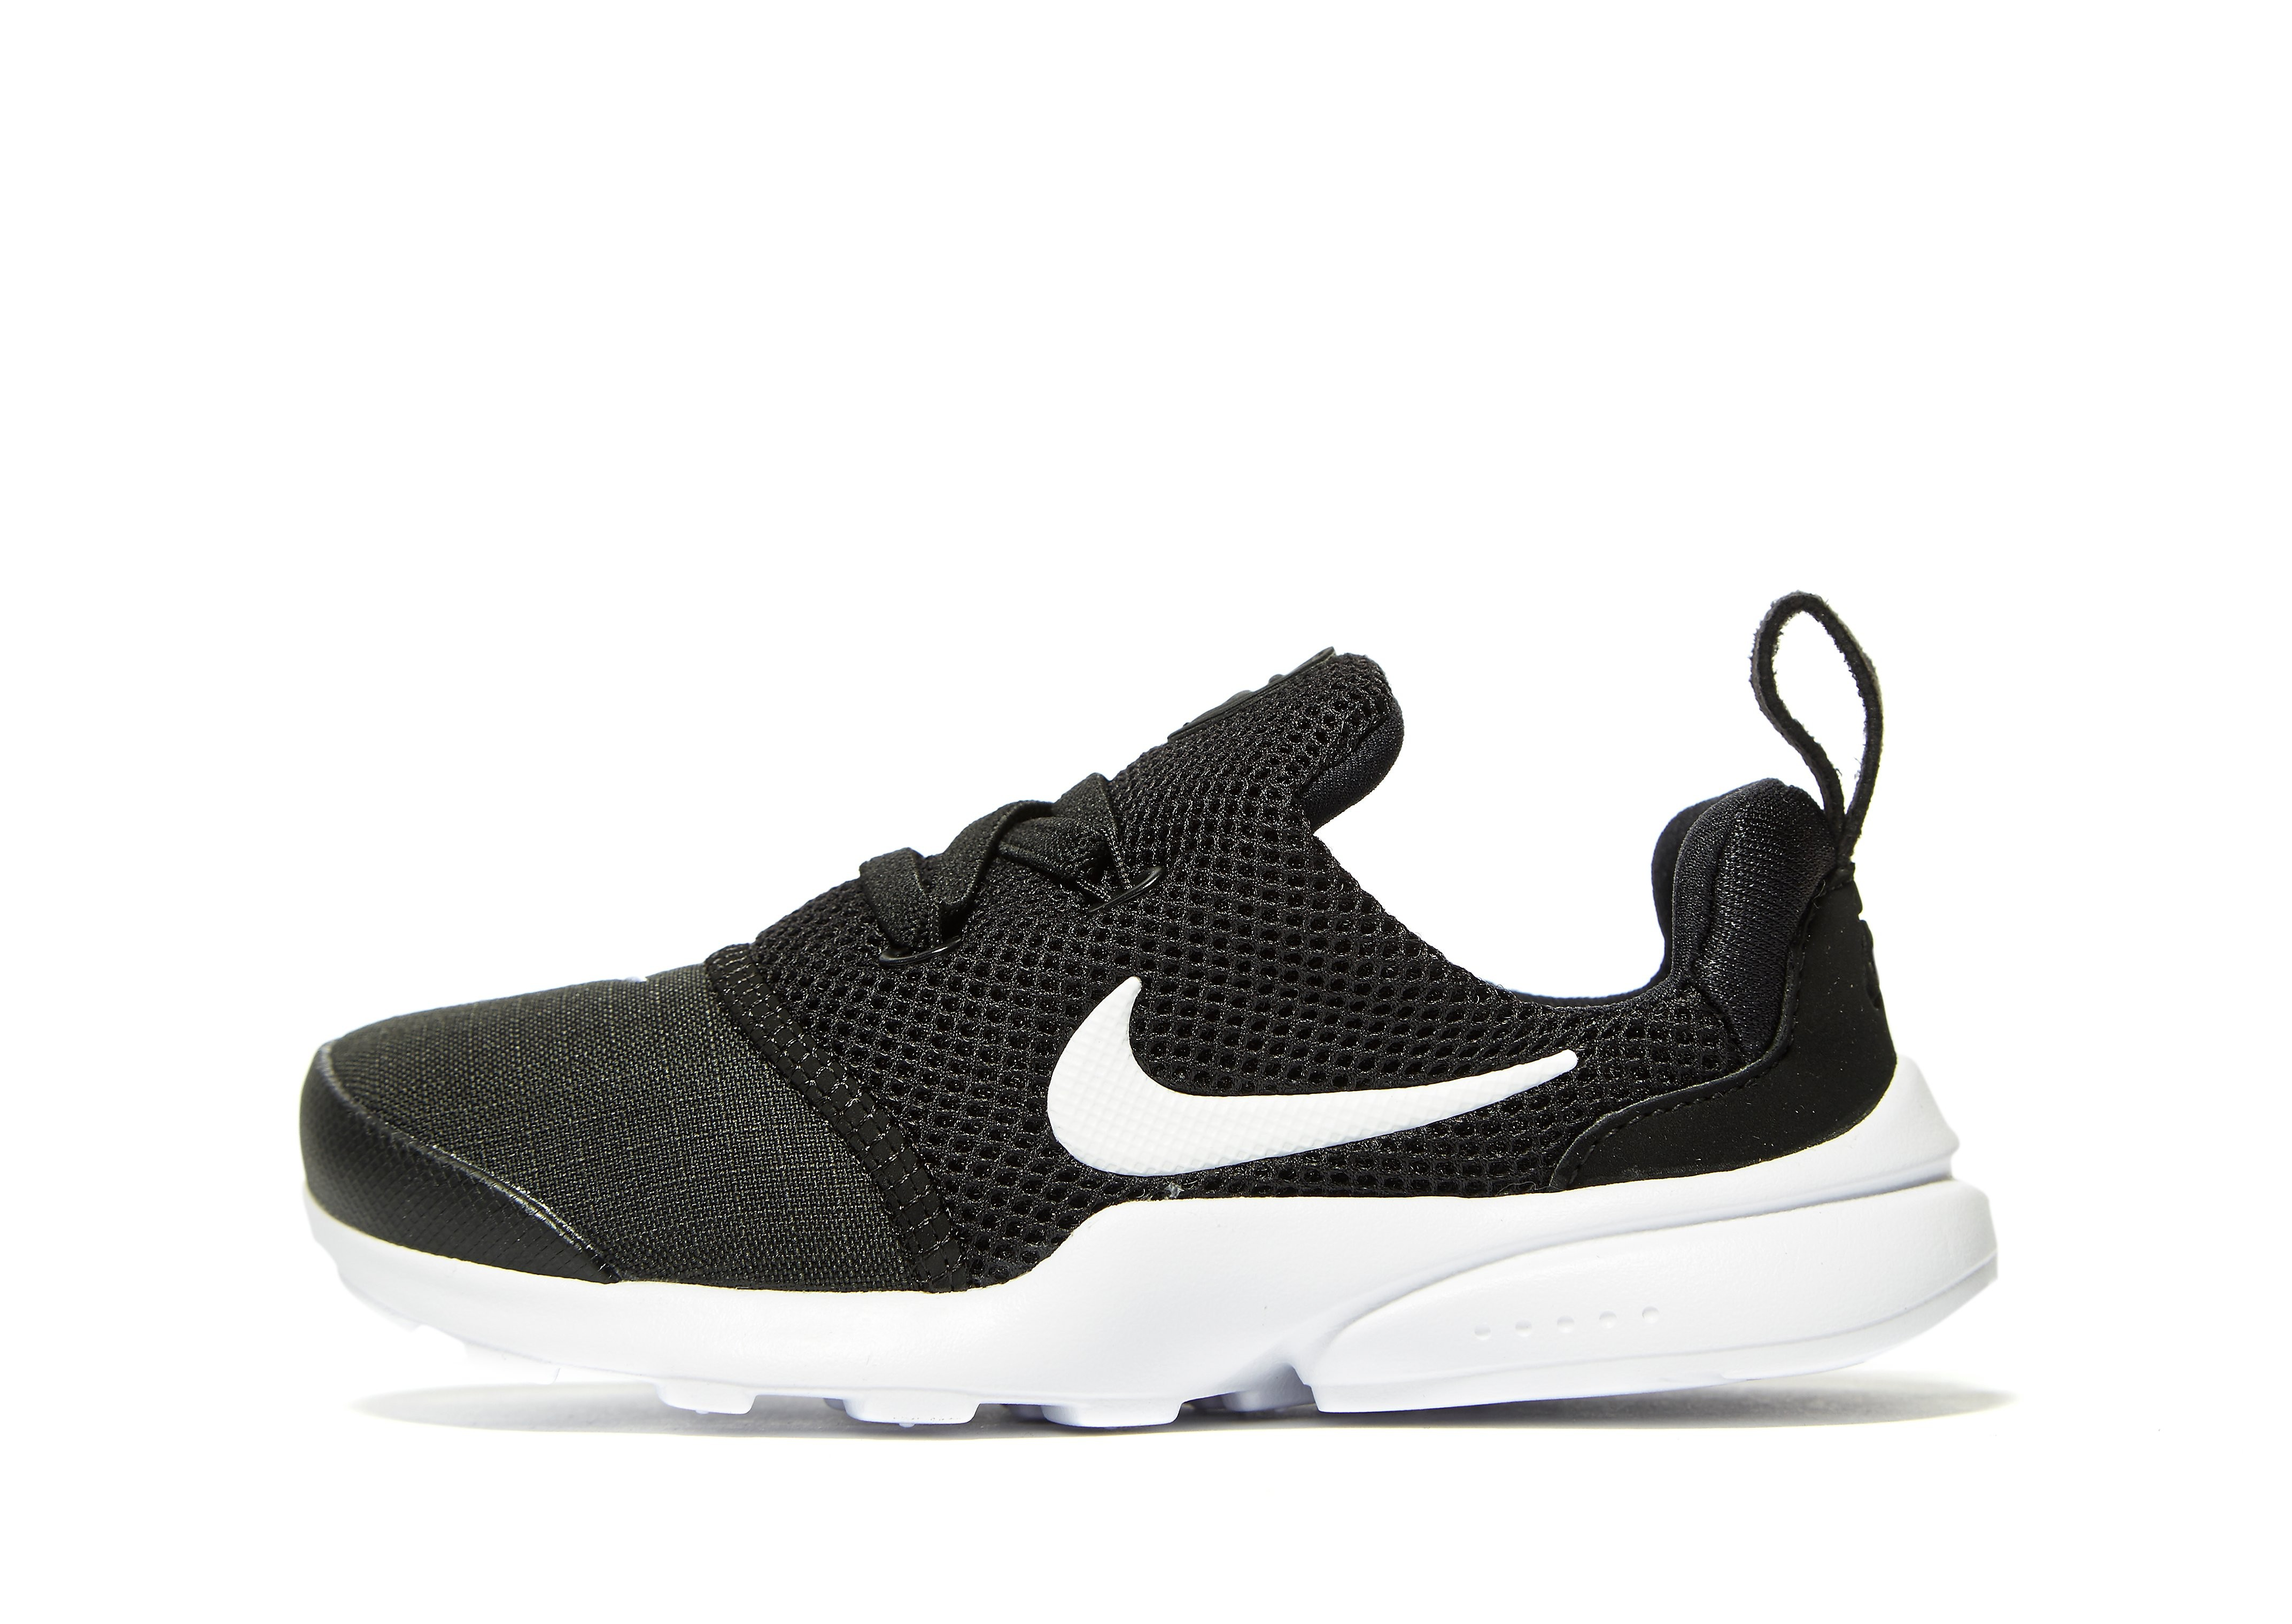 Nike Air Presto Fly SE Kleinkind